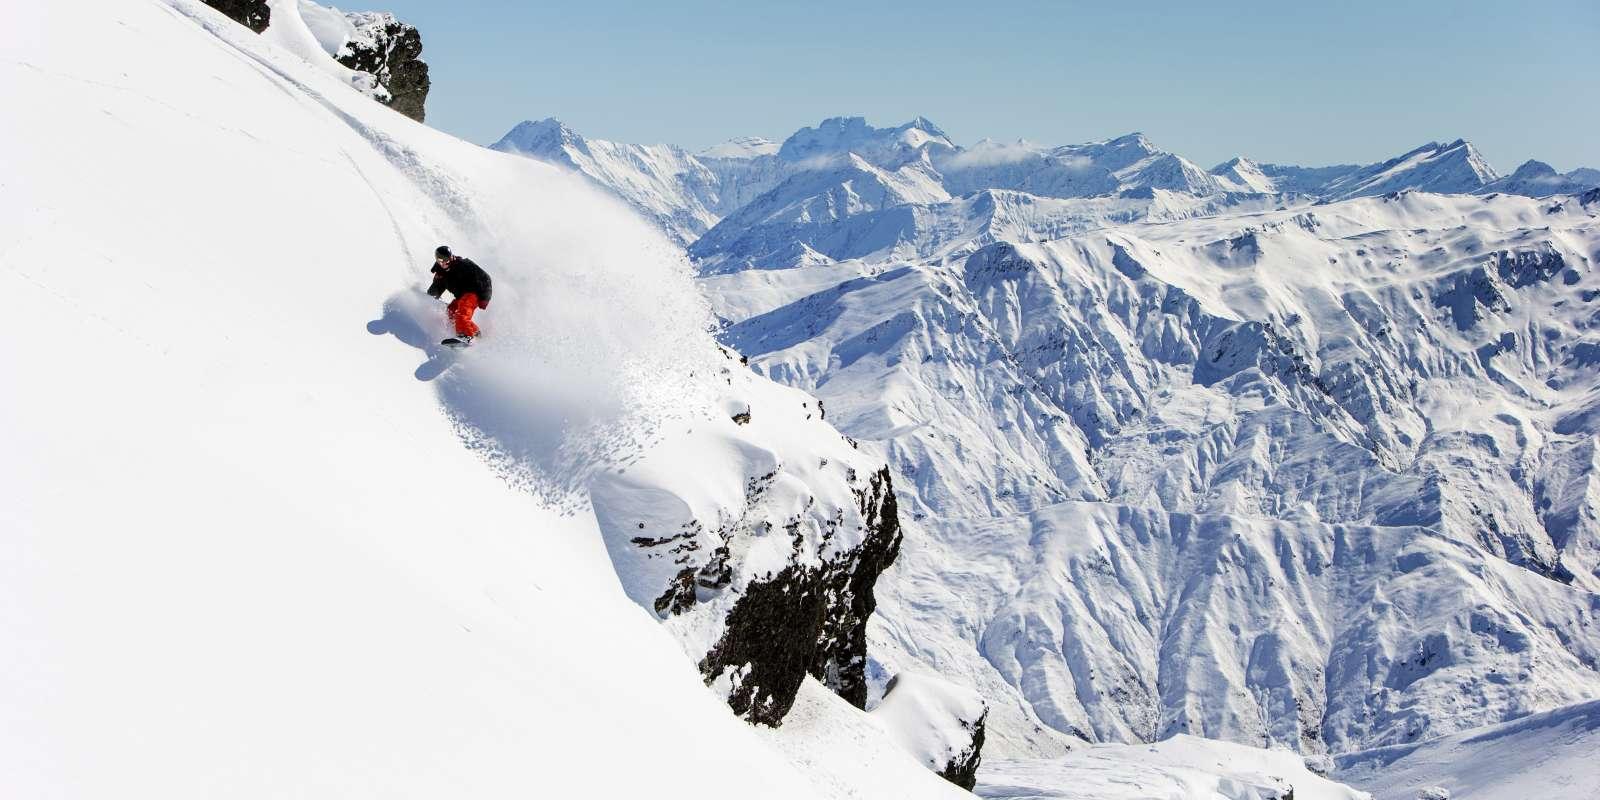 Snowboarding at Cardrona